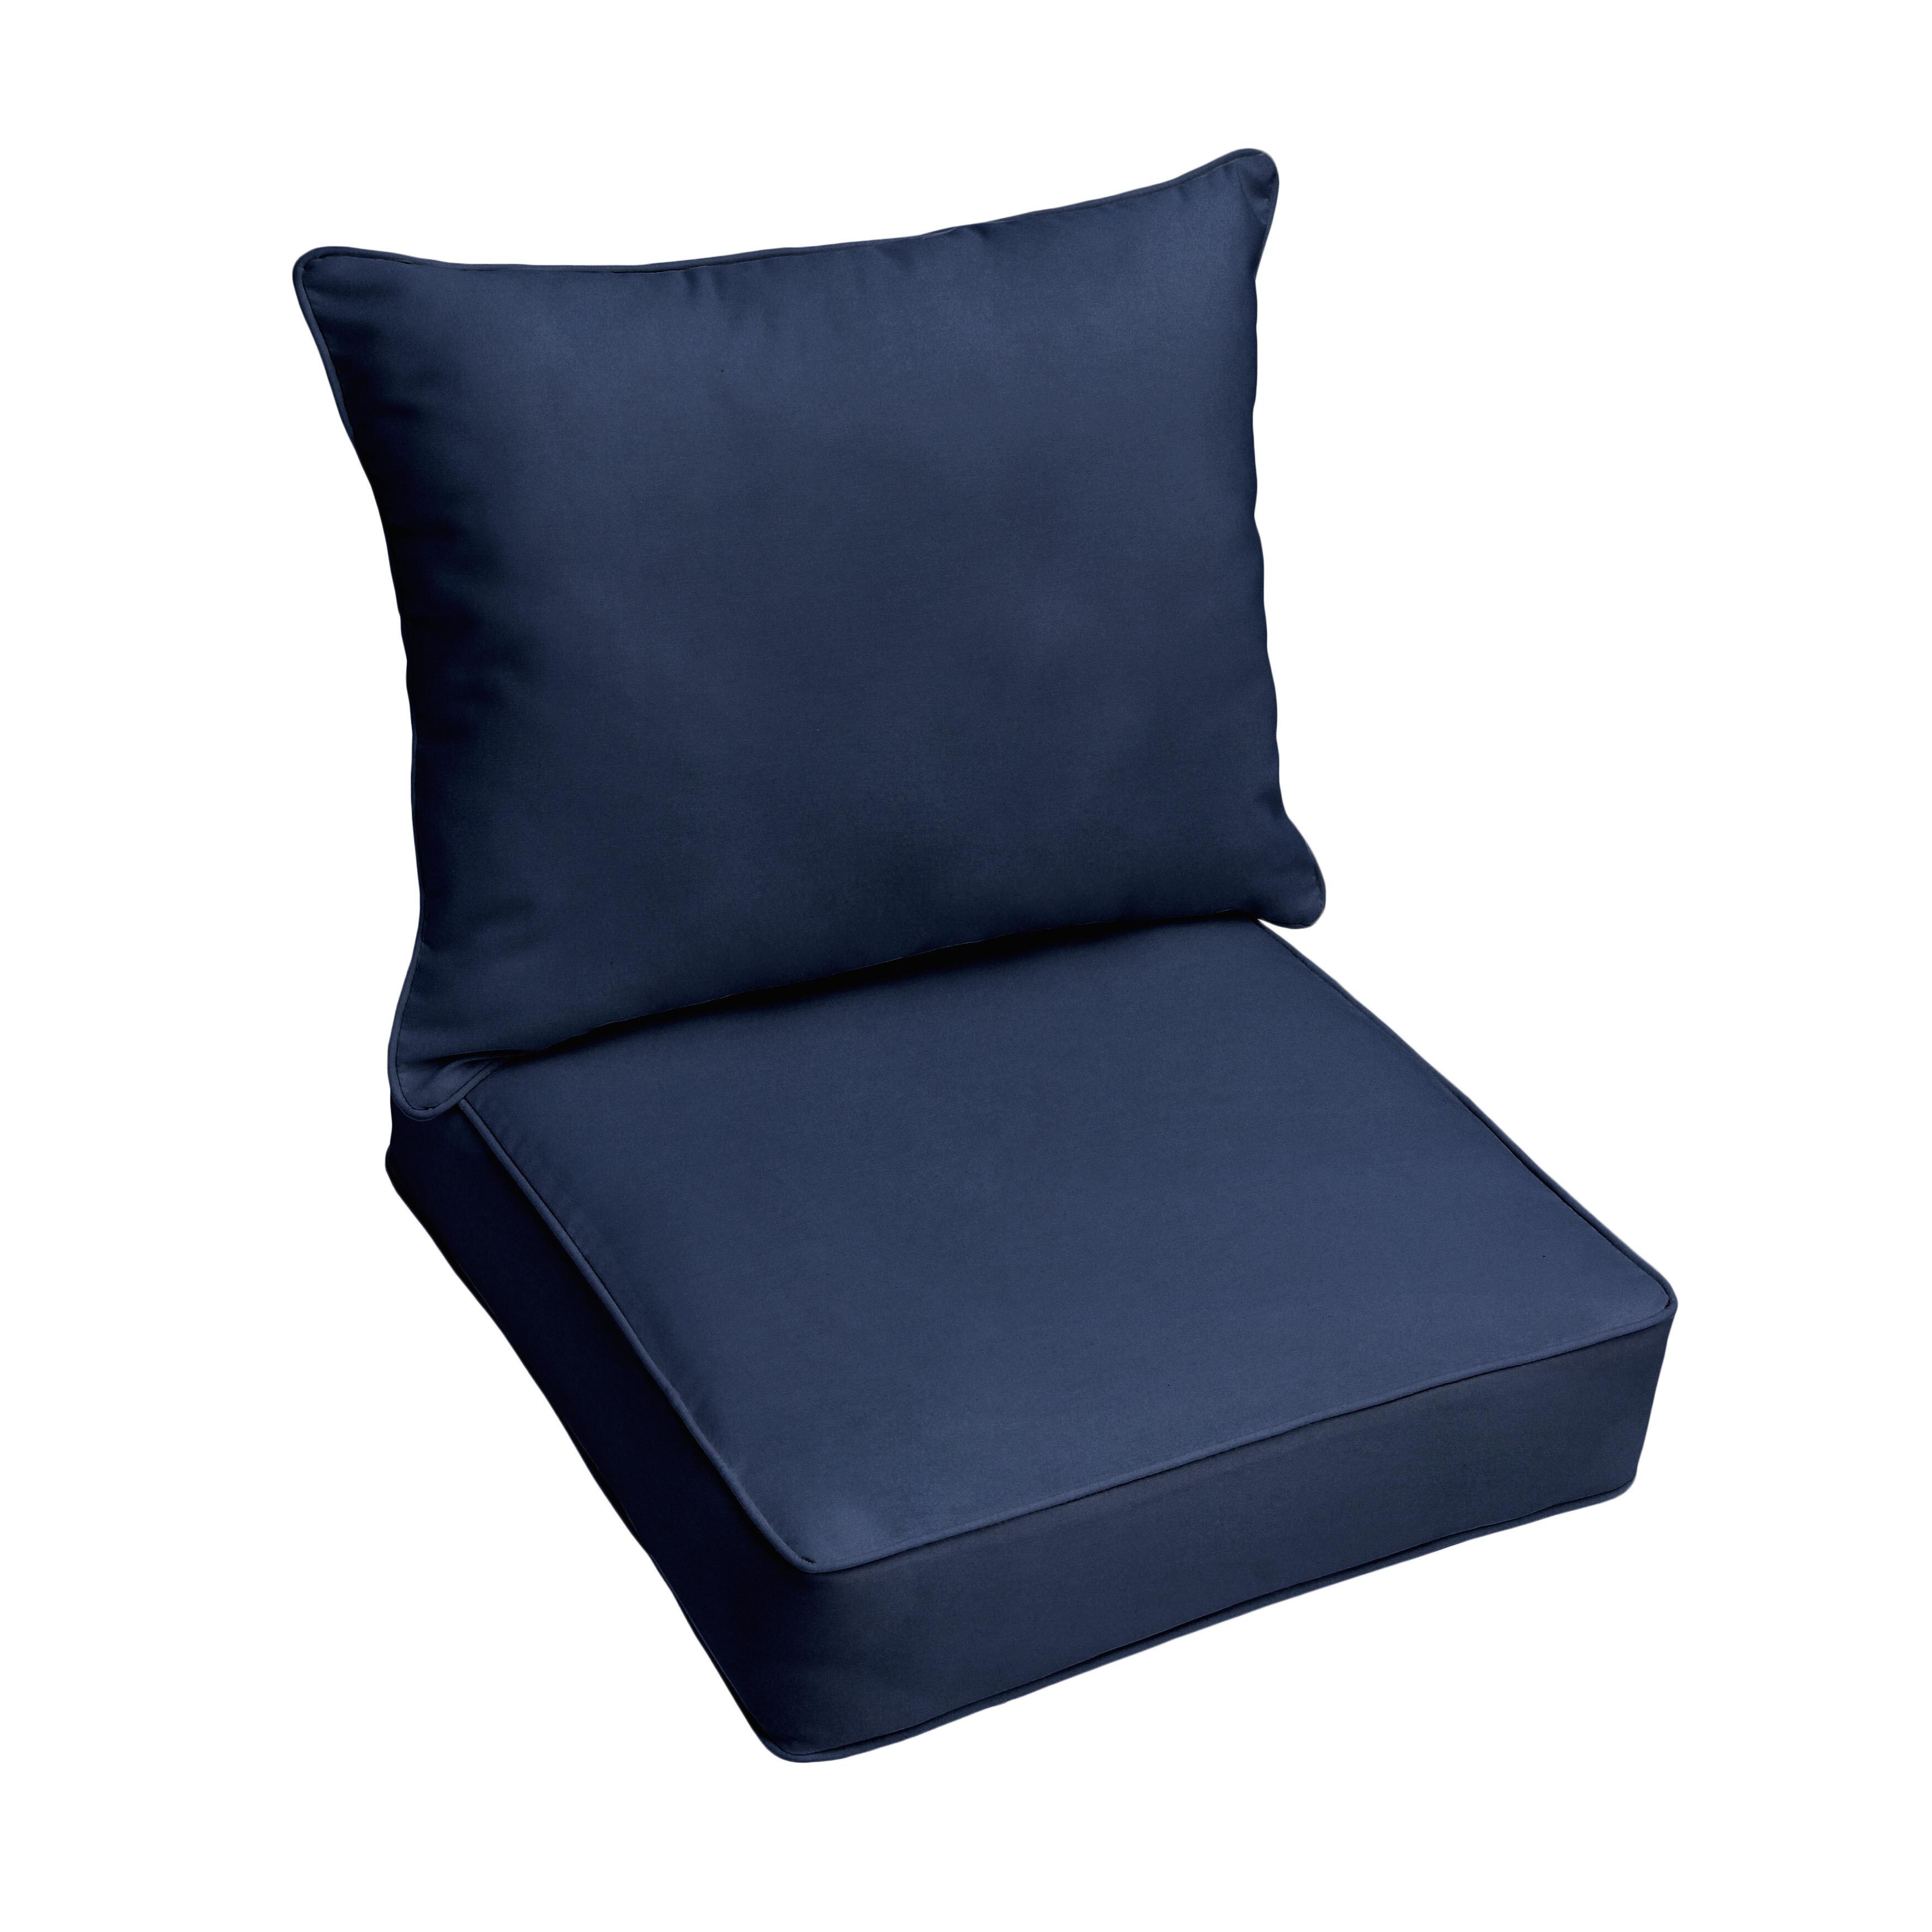 darby home co indoor outdoor sunbrella lounge chair cushion wayfair